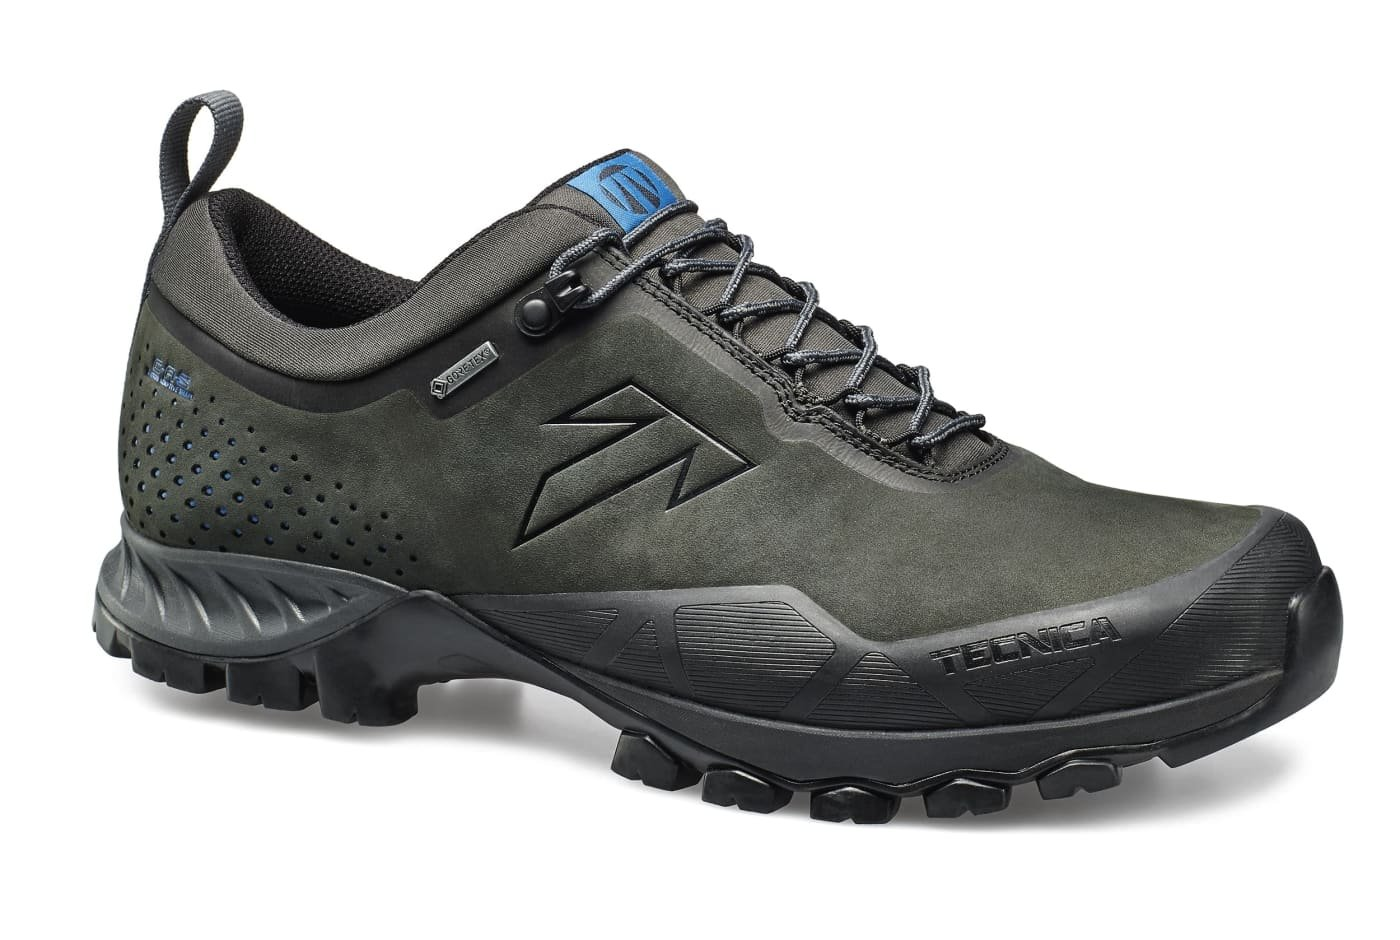 Tecnica Plasma GTX MS Hiking Shoe - Black SR Laterite